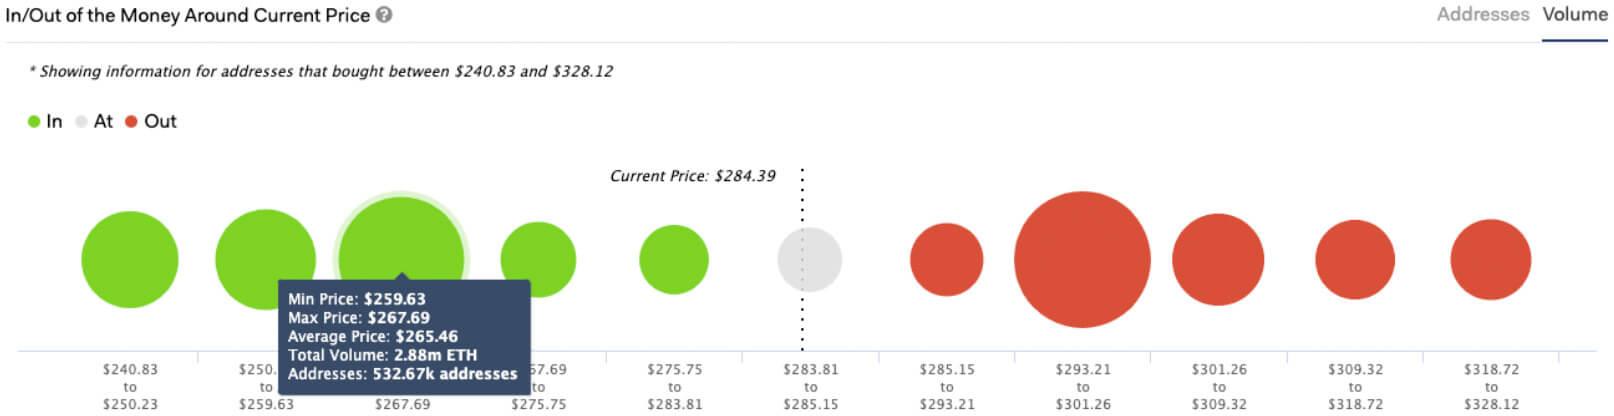 Ethereum In/Out Money Around Current Price (Source: IntoTheBlock)